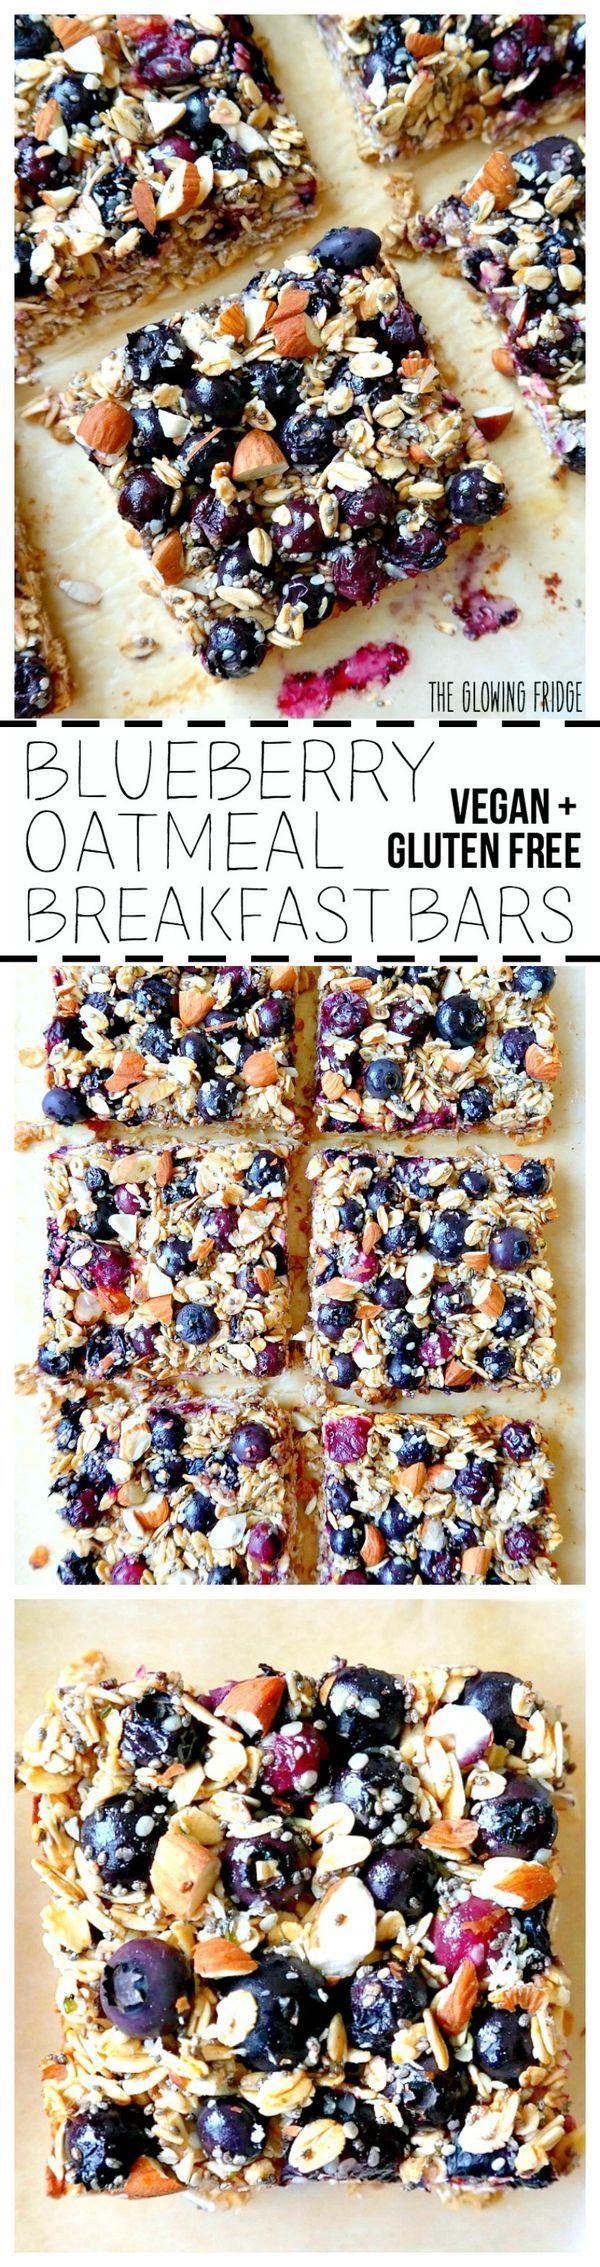 Blueberry Oatmeal Breakfast Bars #fitness #fitnessideas #diet